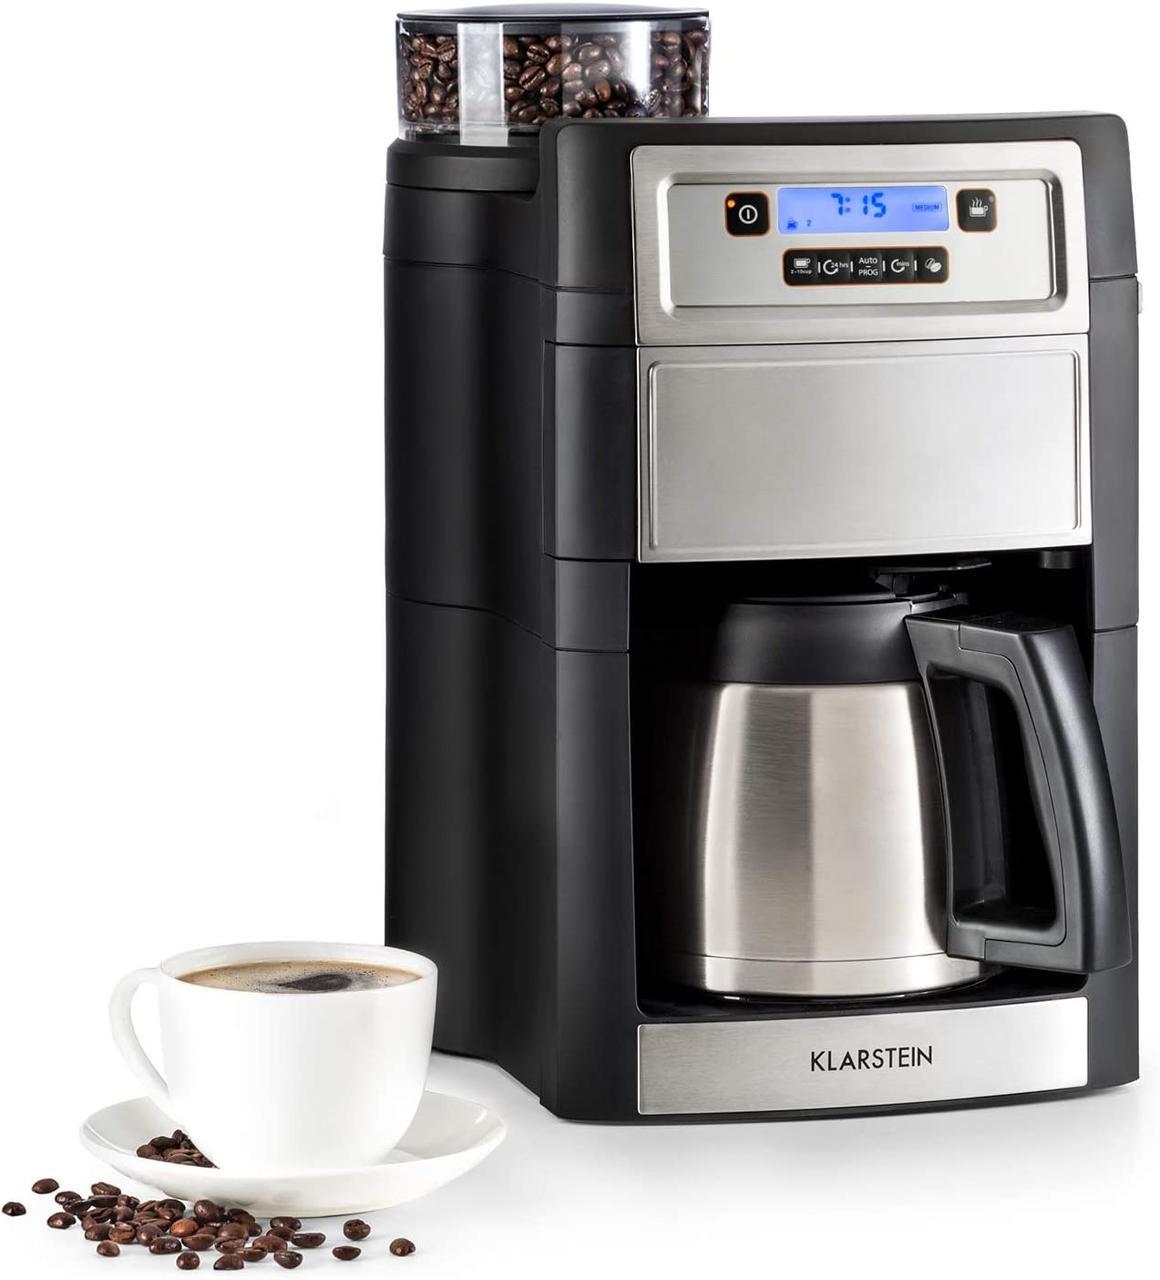 Кофеварка капельная - Klarstein KG13 Aromatica II F, 1.25 Liter, 1000